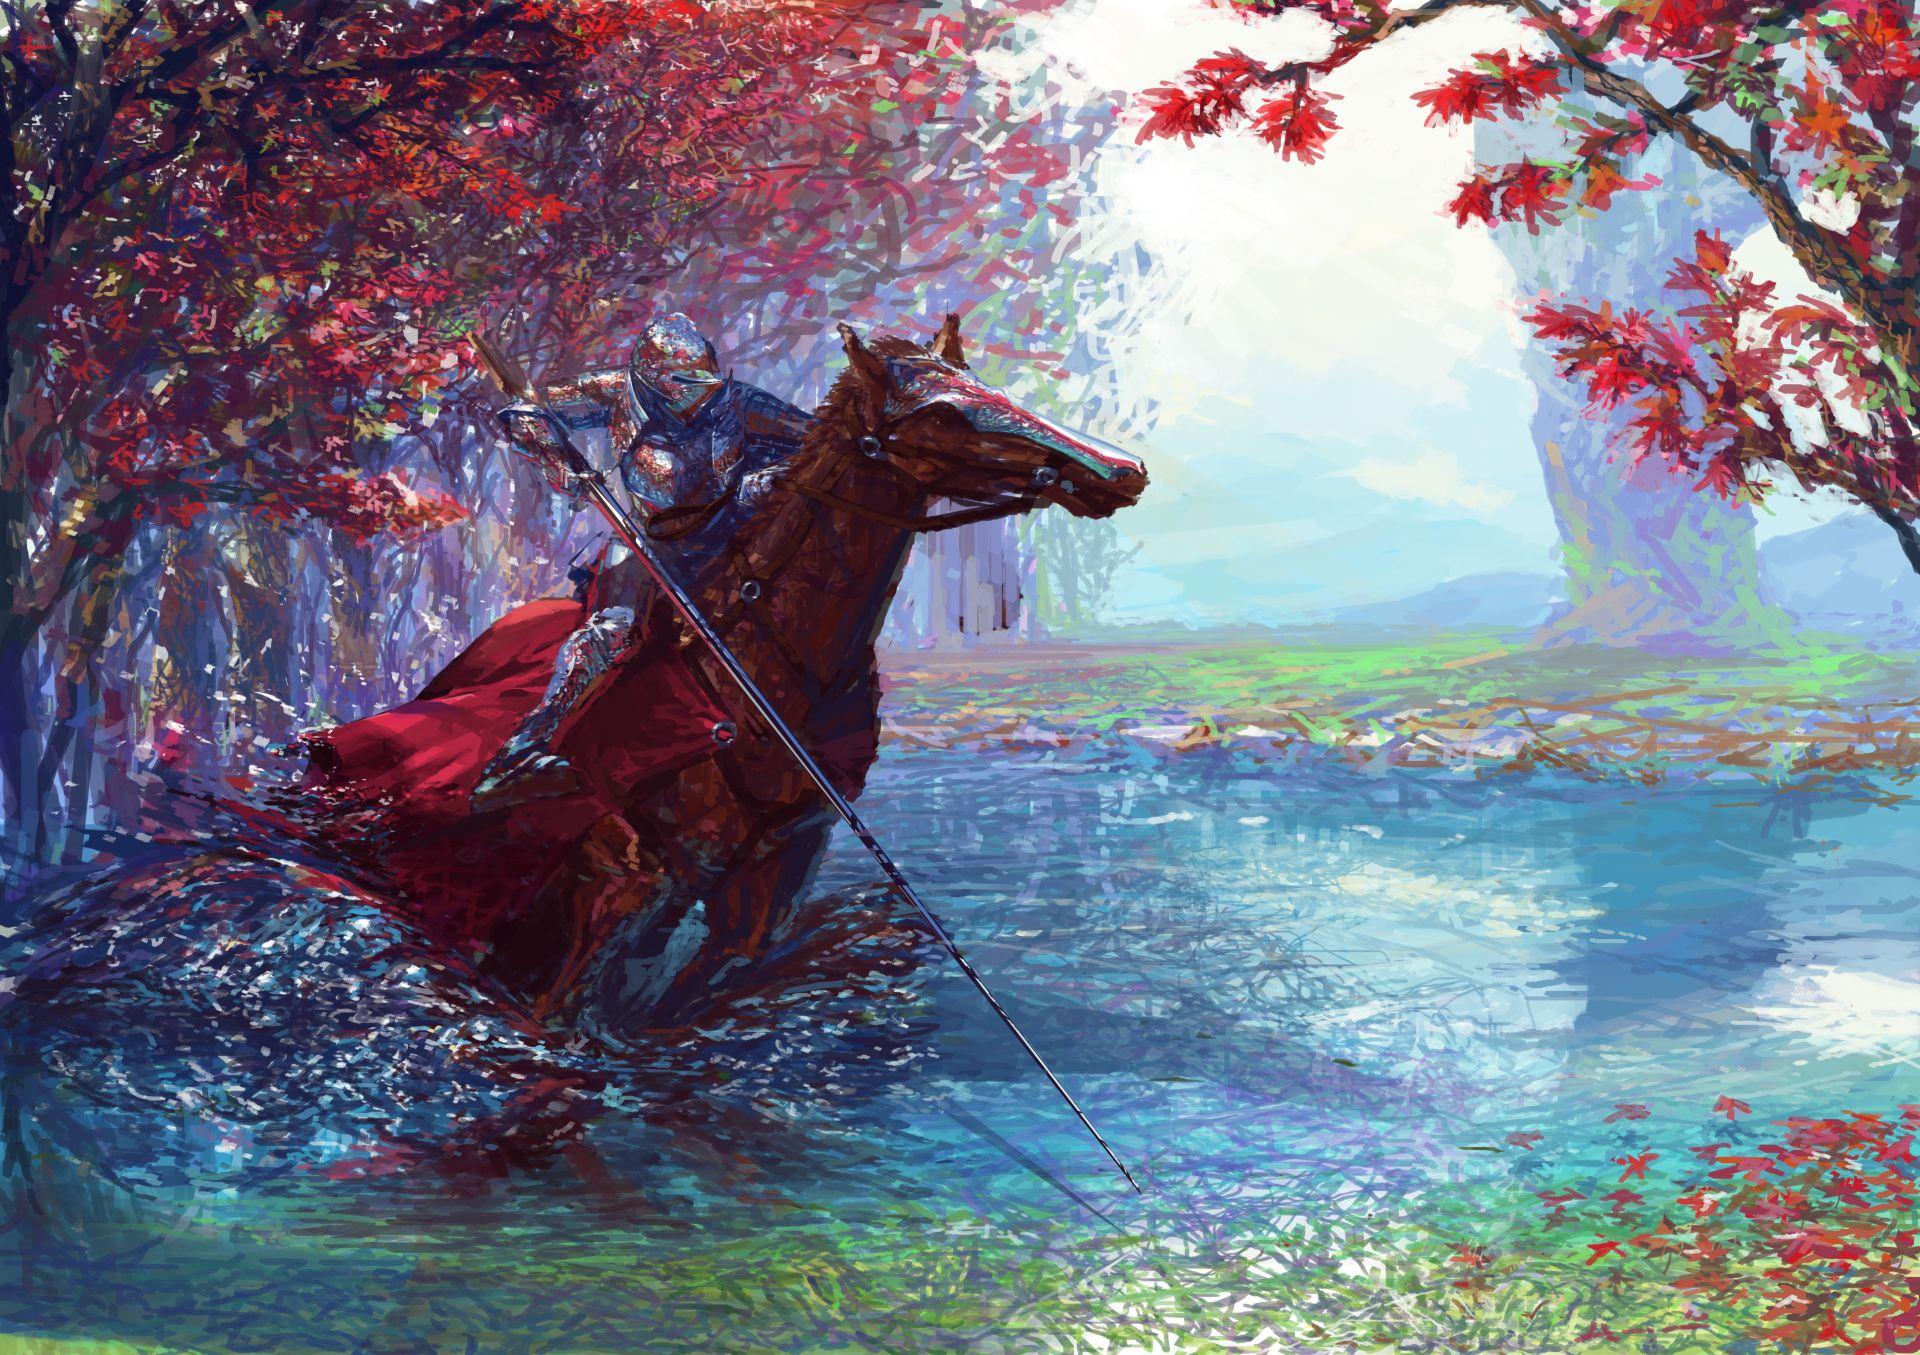 Download Wallpaper Horse Water - 08edf4c26557ecf2f63e0183f17292c4  Collection_142279.jpg